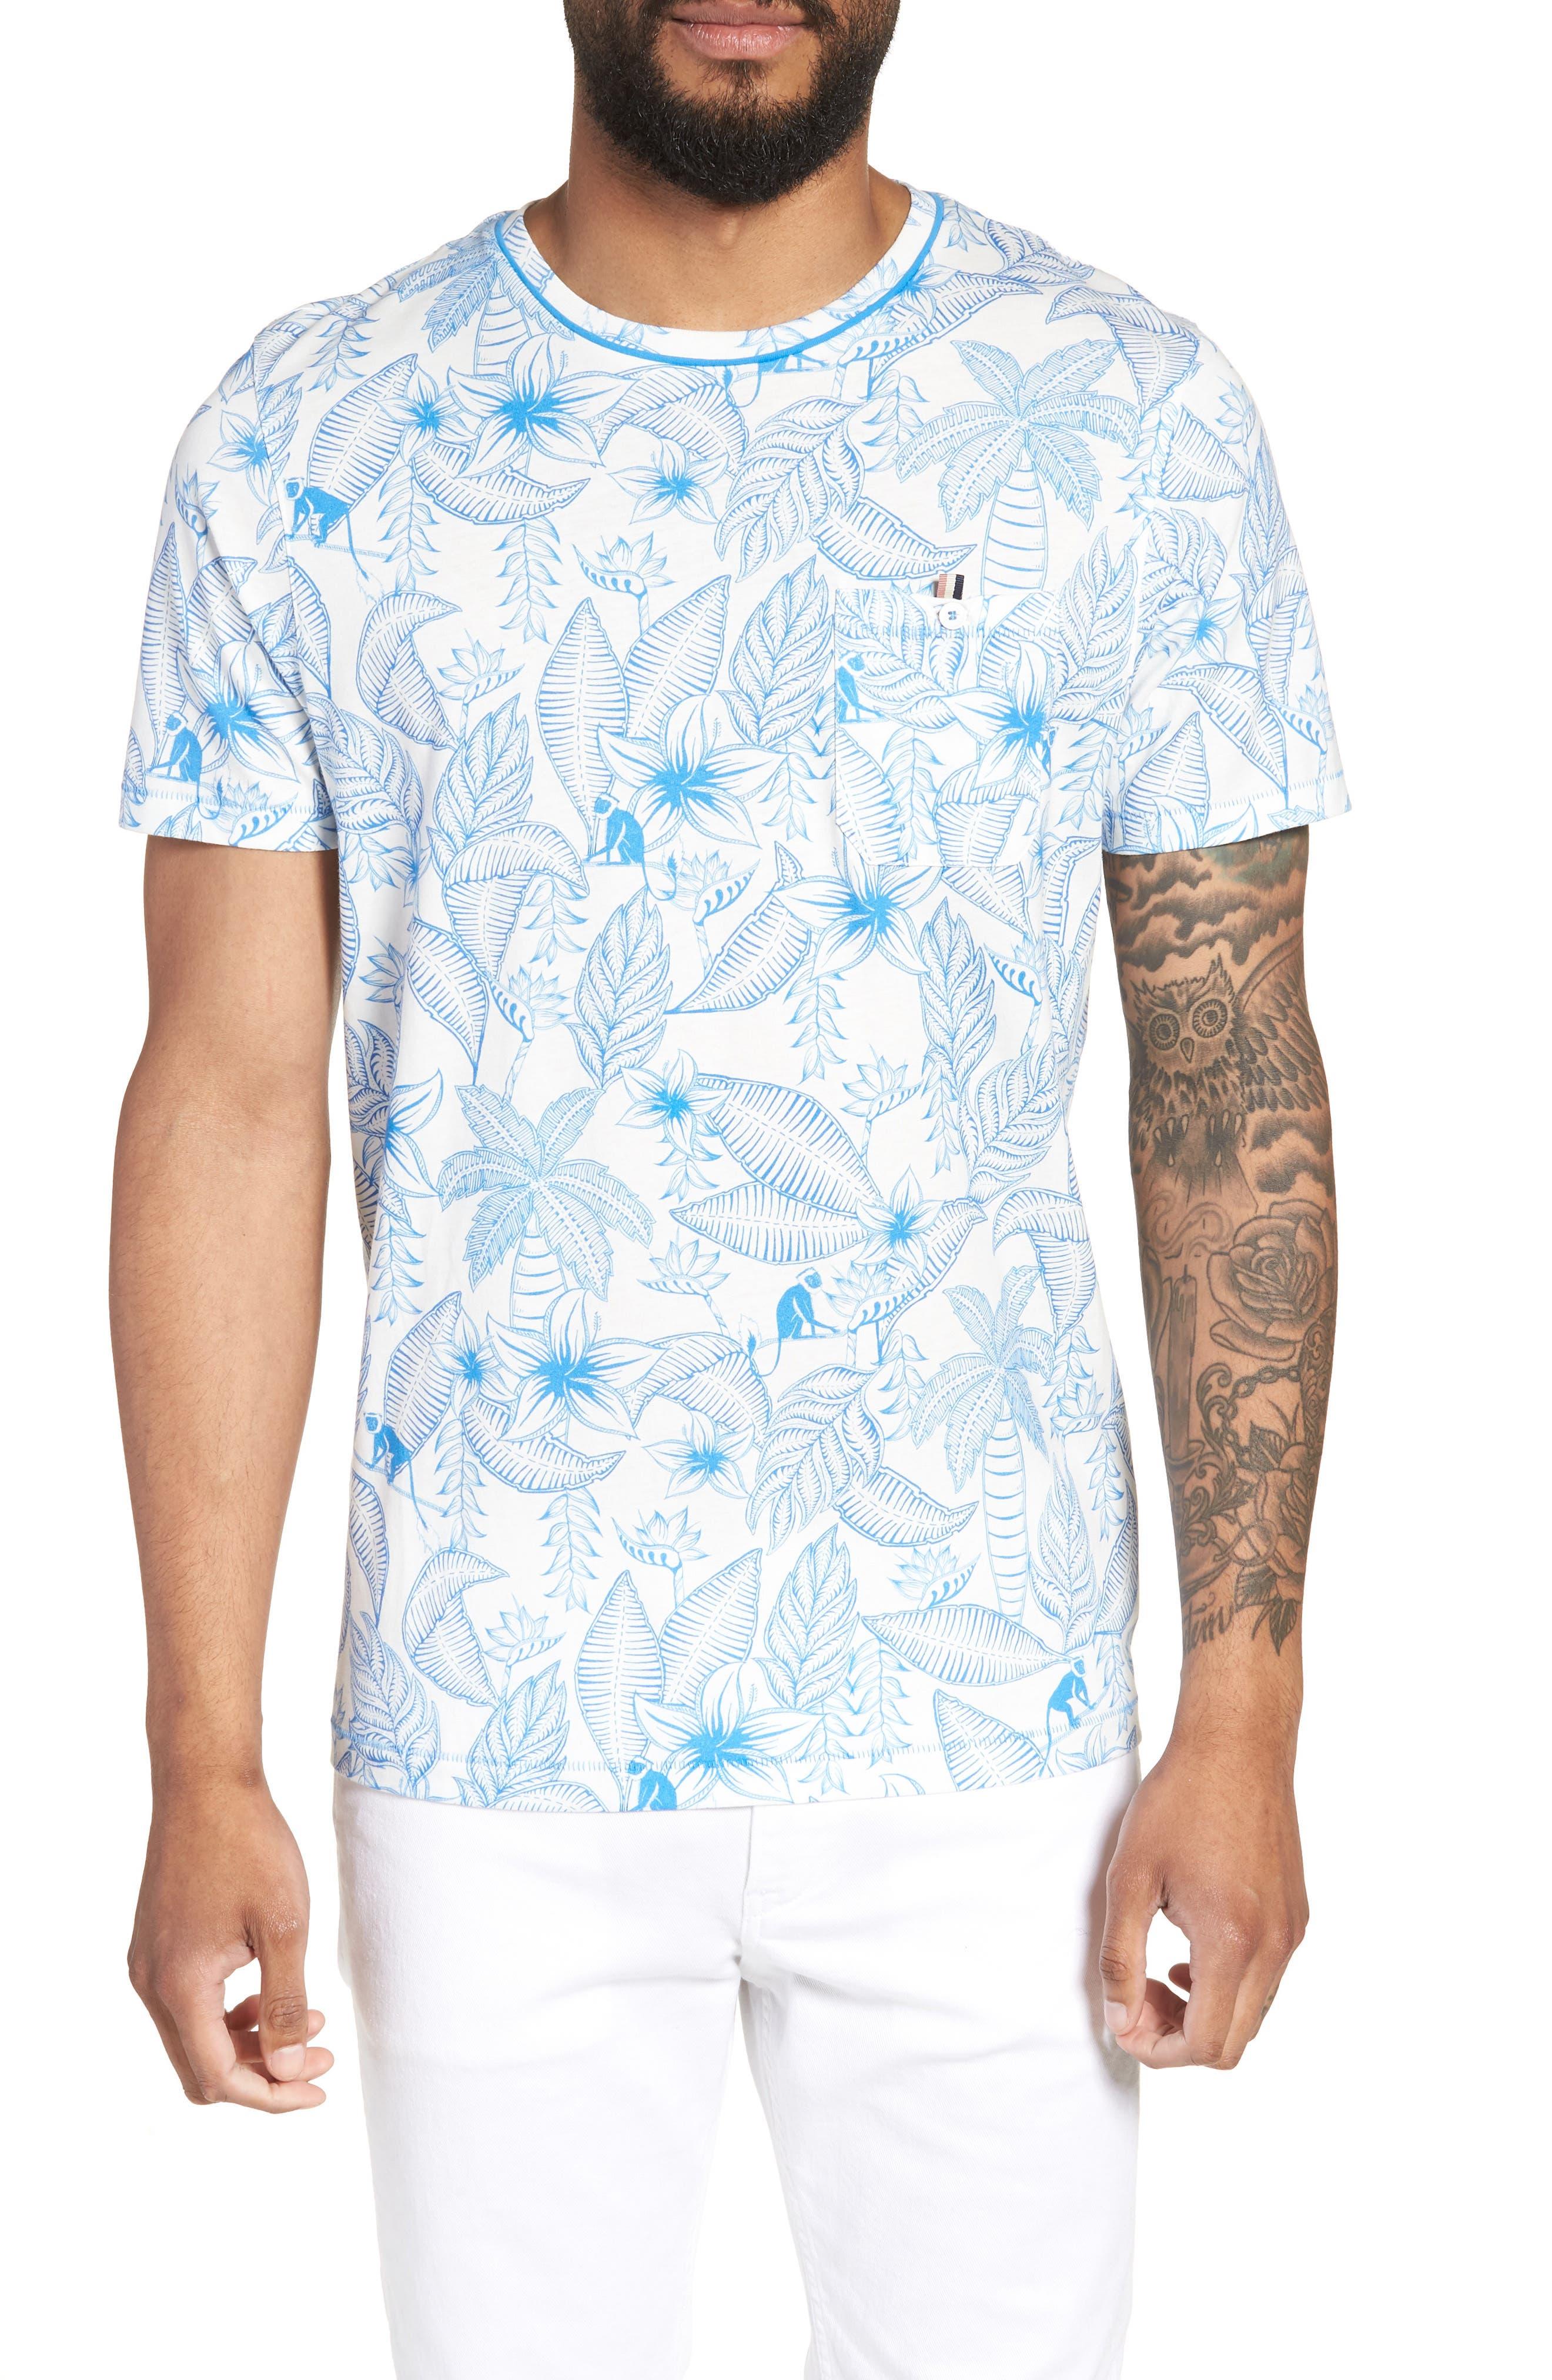 Bengel Crewneck T-Shirt,                             Main thumbnail 1, color,                             BRIGHT BLUE